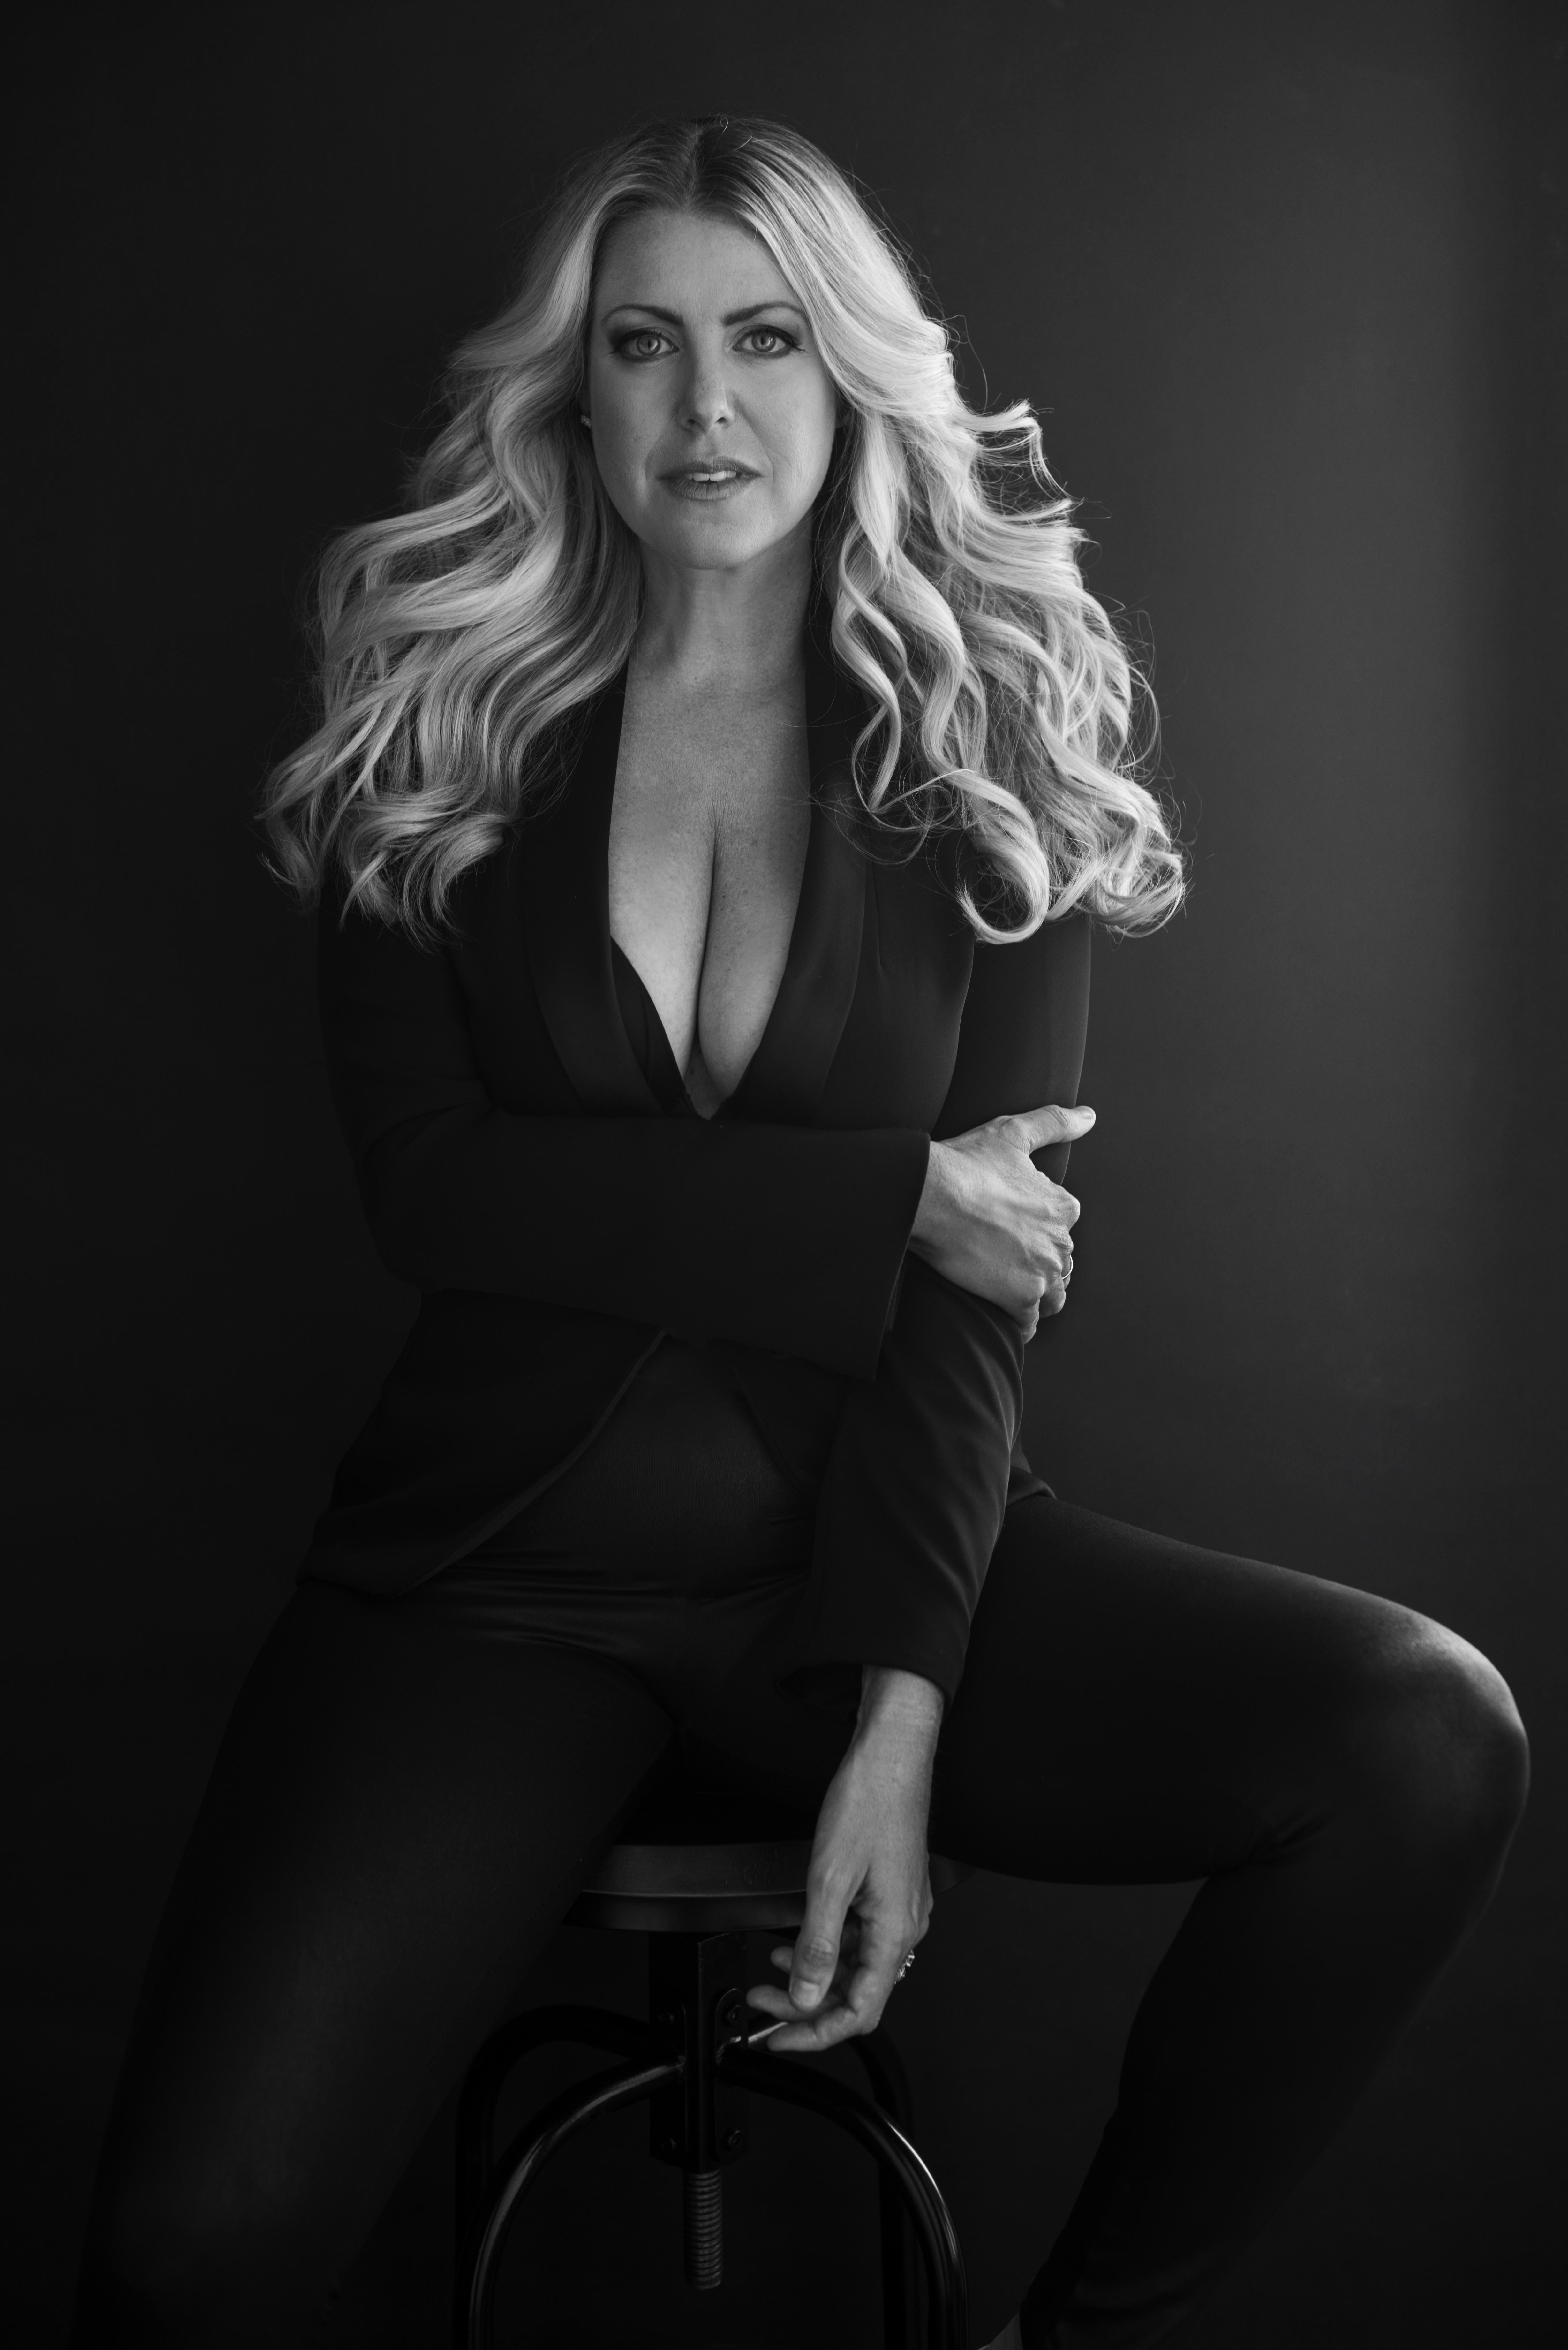 portrait-photography-virginia